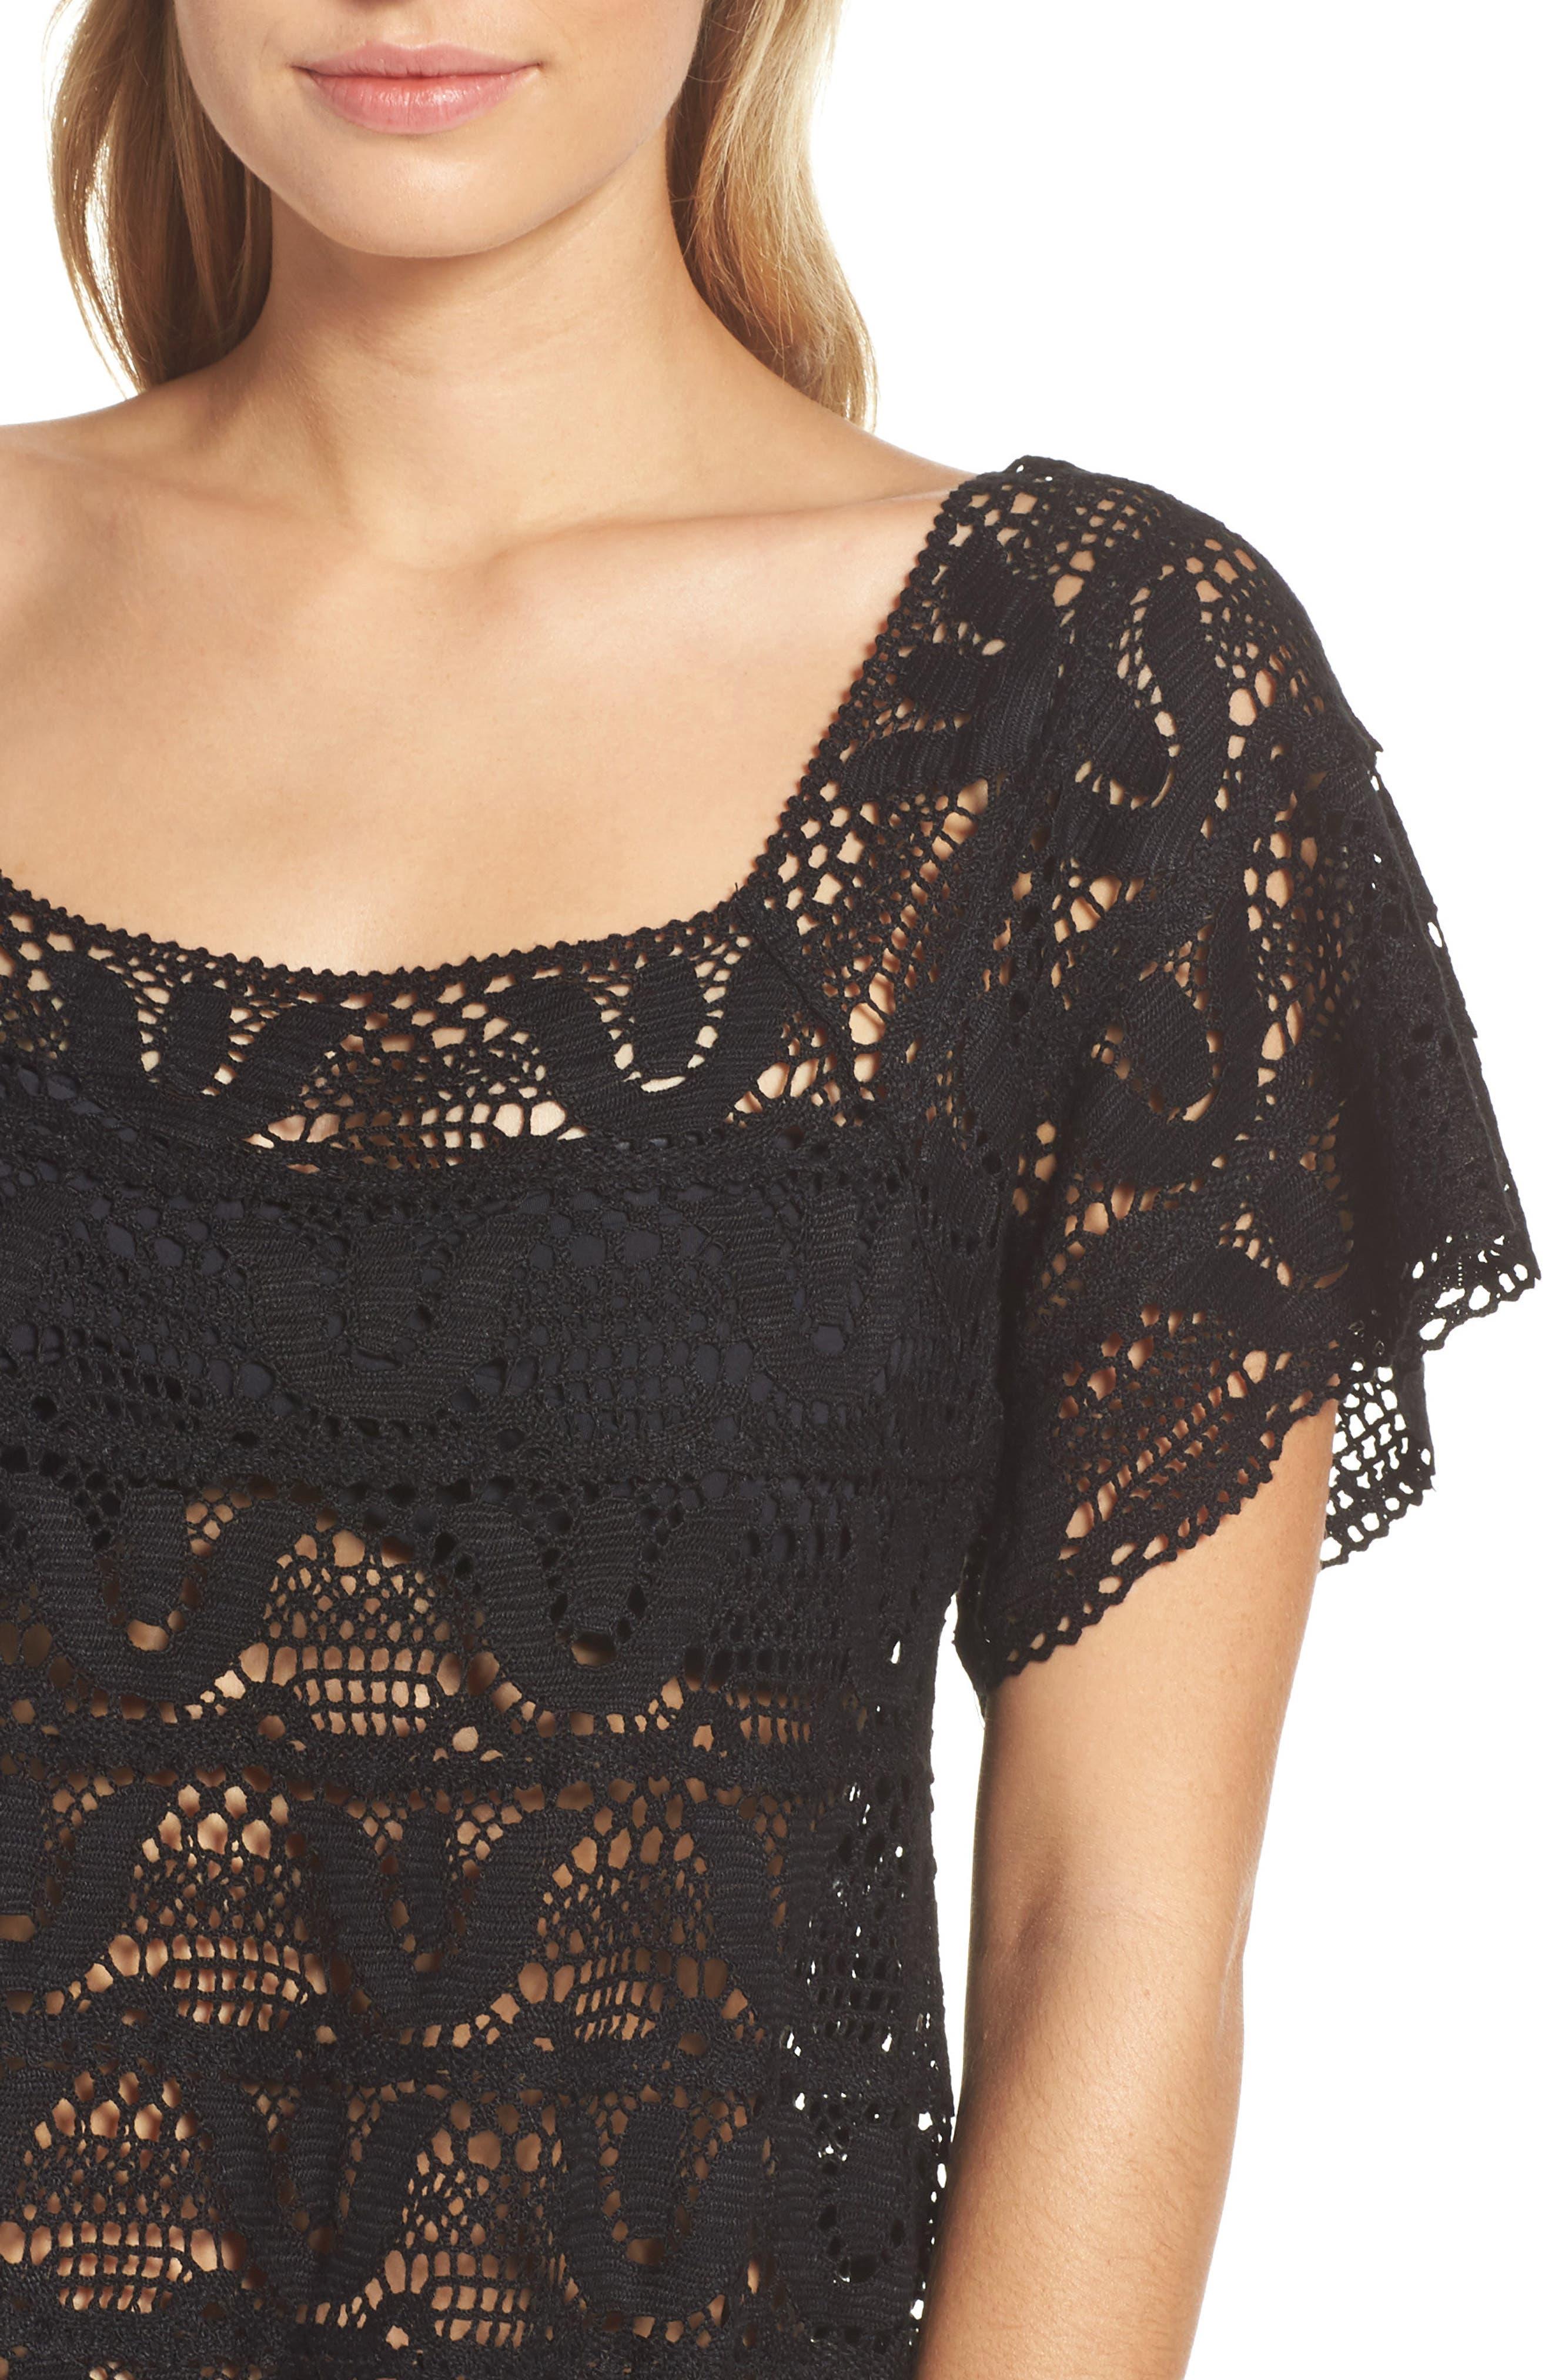 Nanette Lapore Crochet Cover-Up Dress,                             Alternate thumbnail 4, color,                             001